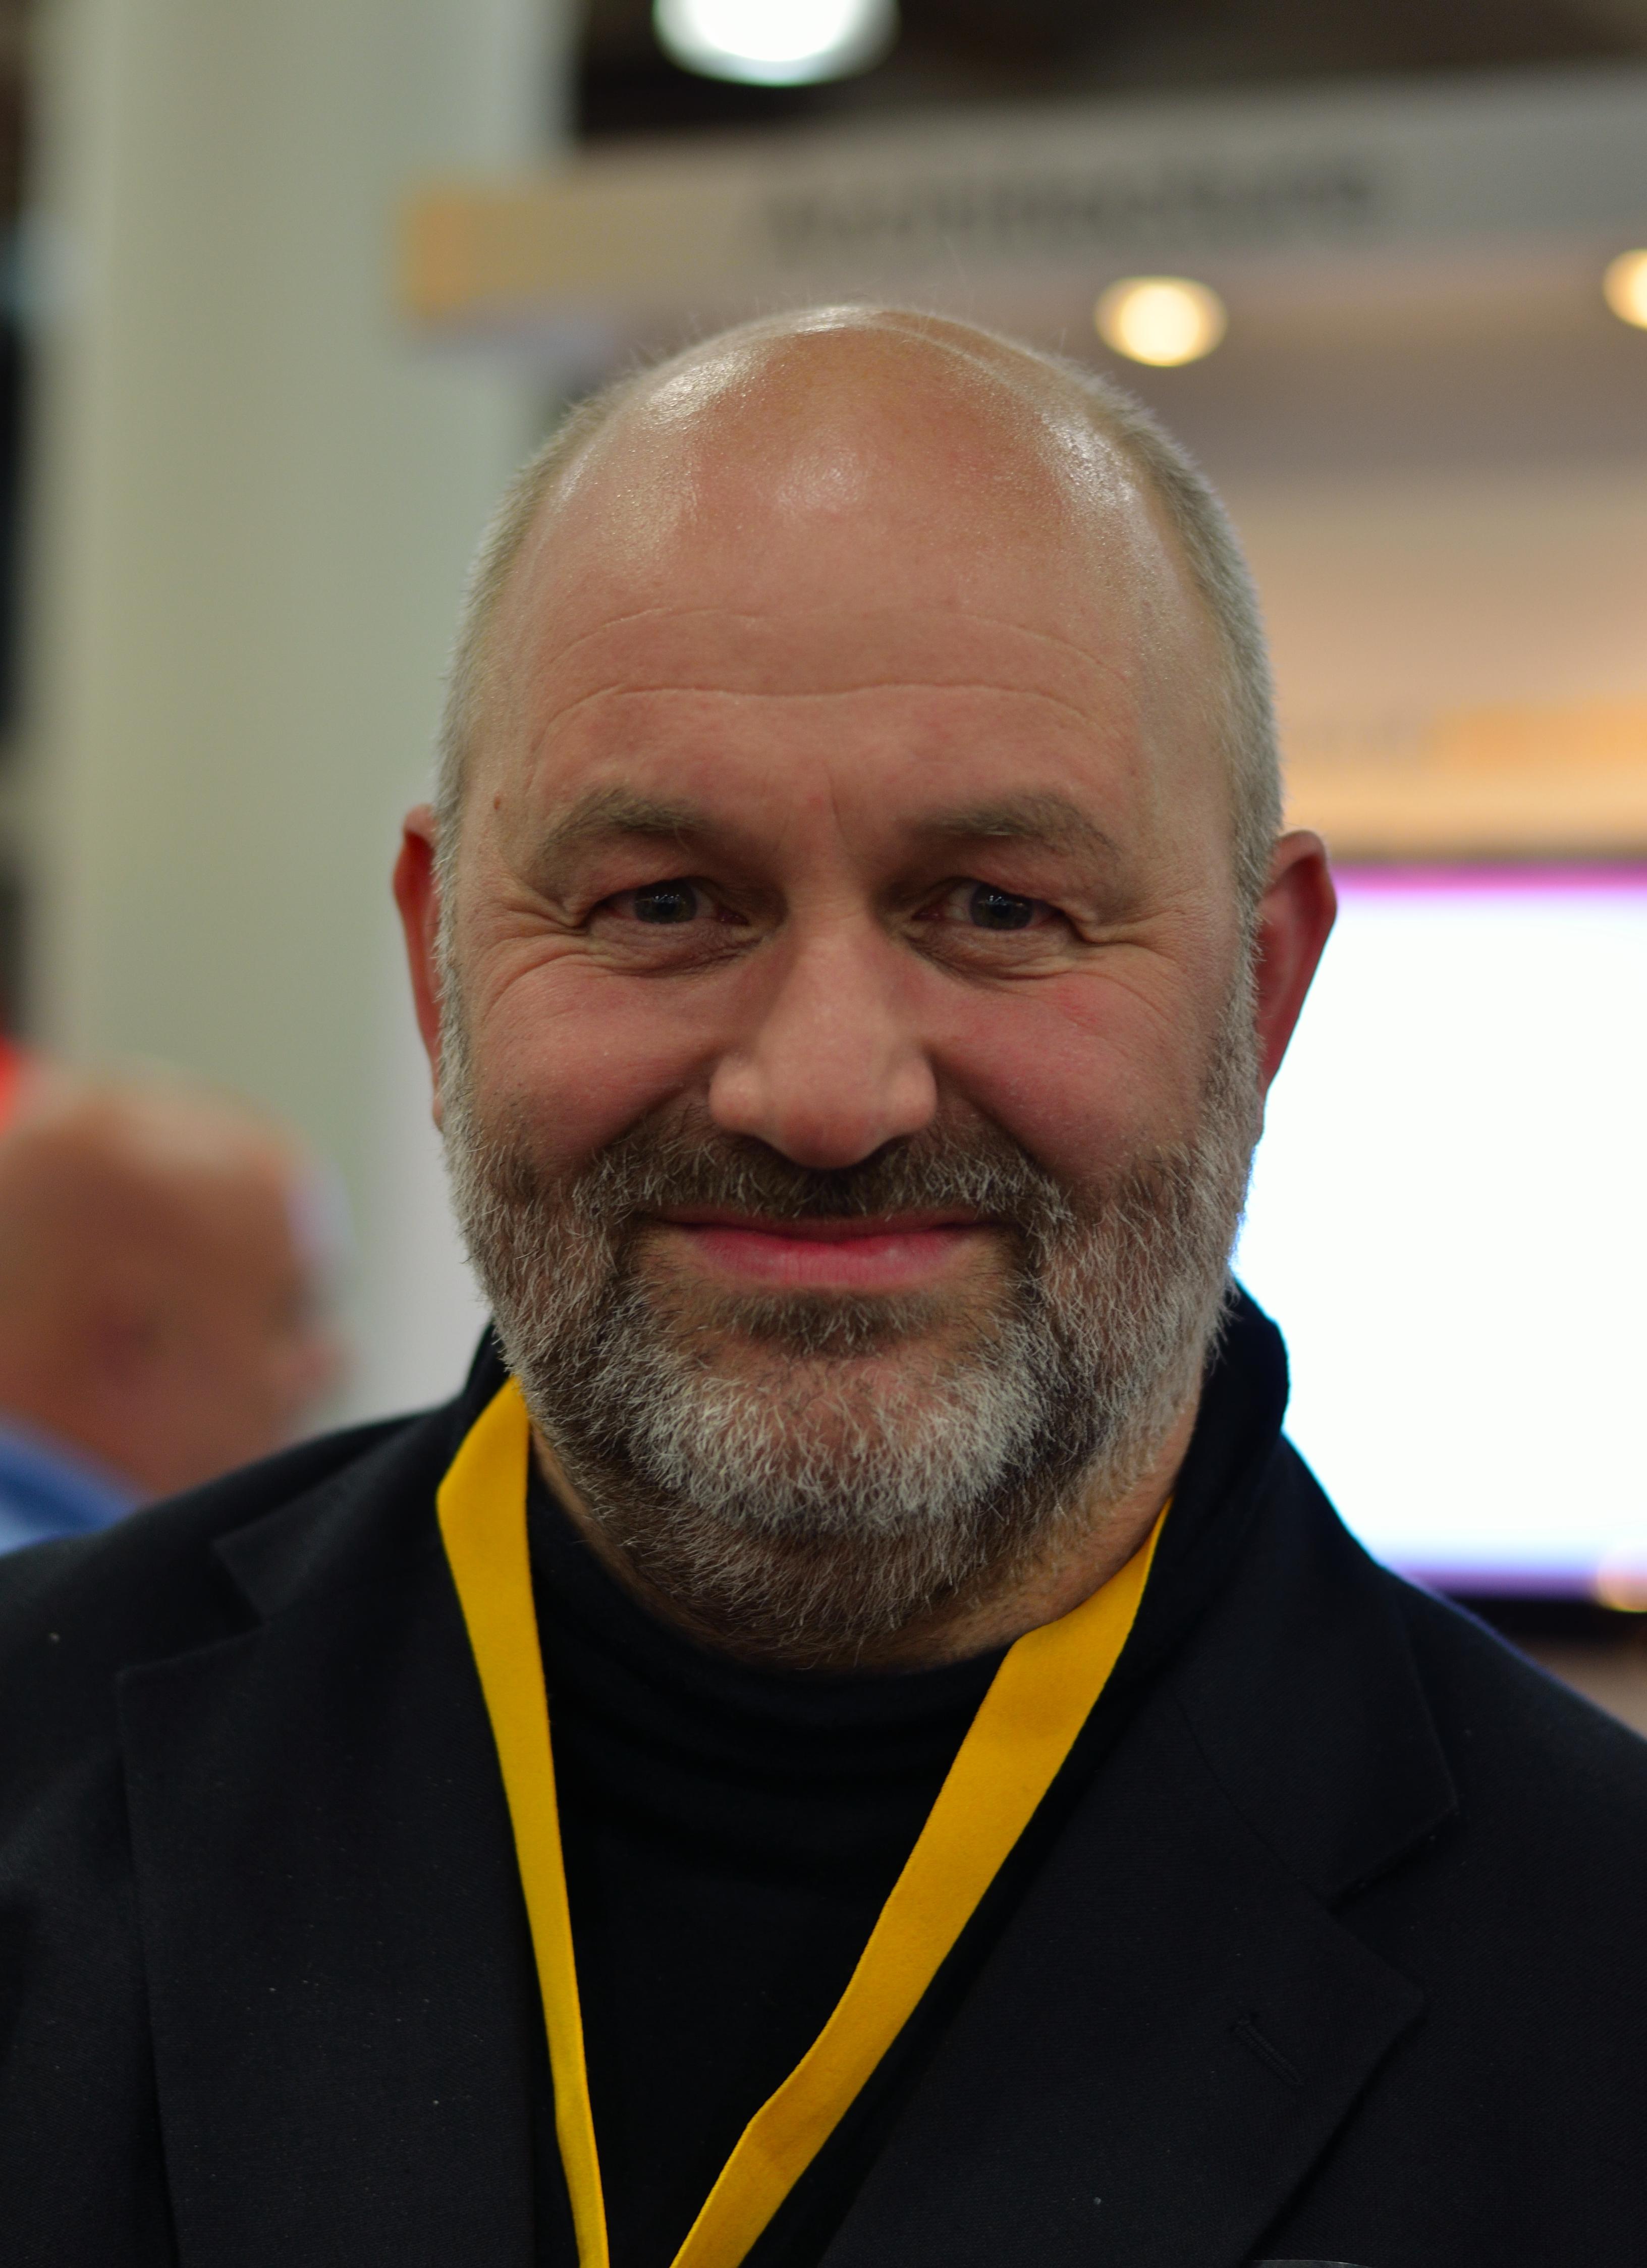 Werner Vogels - Wikipedia